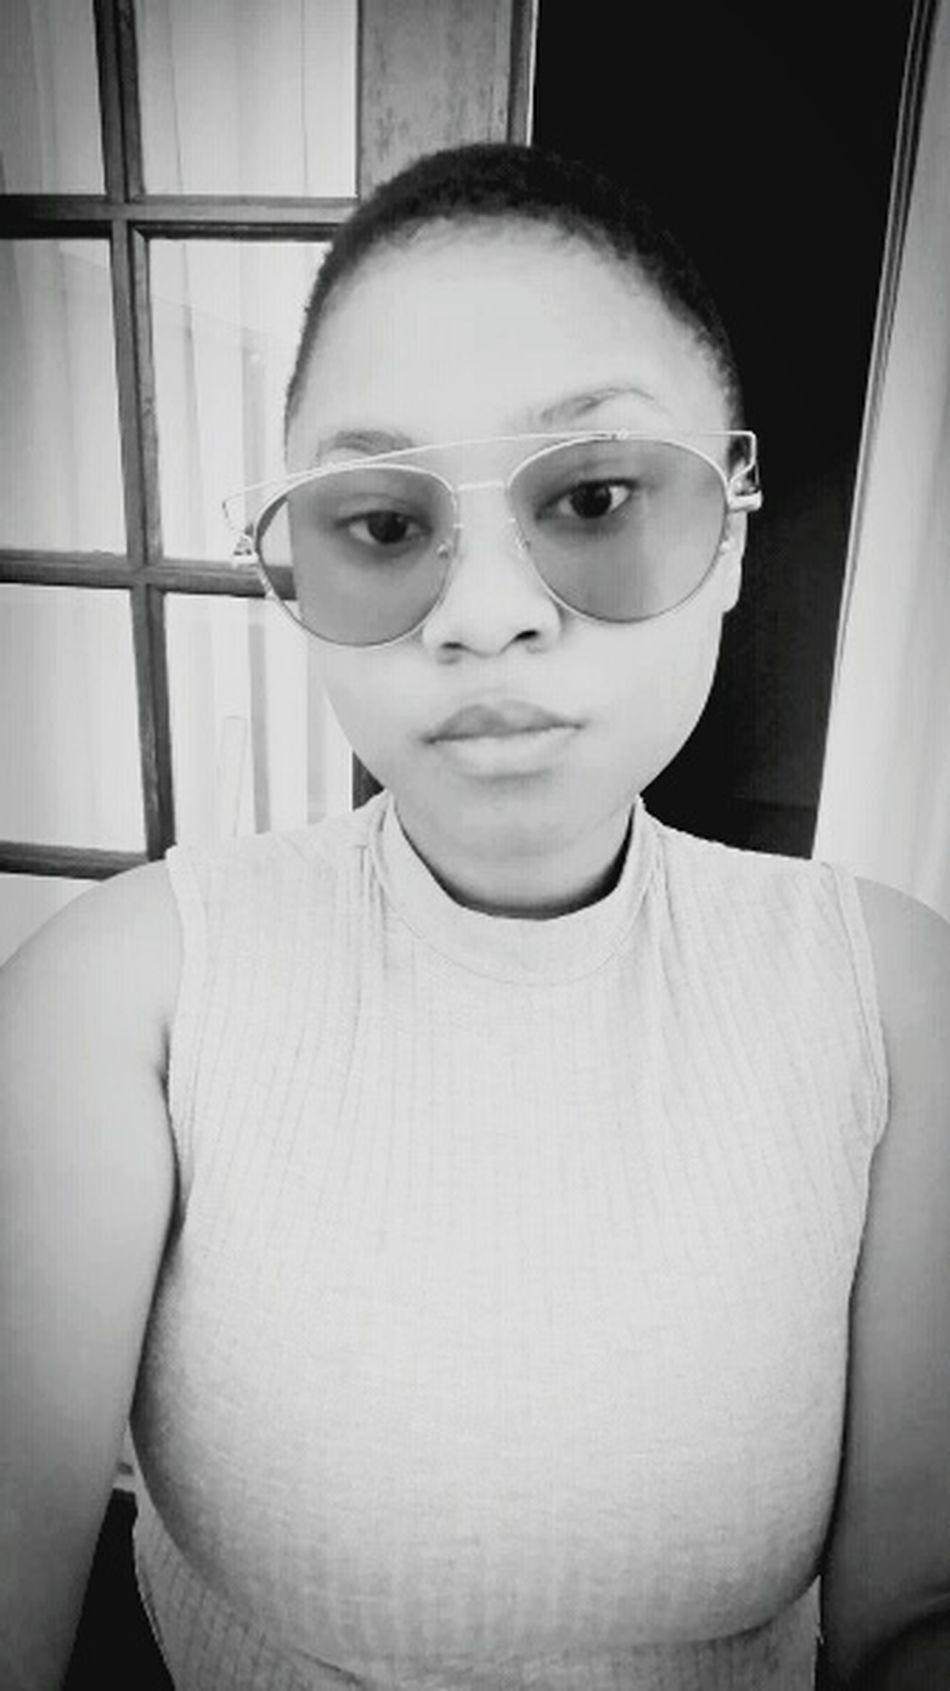 Looking At Camera Sunglasses ✌👌 First Eyeem Photo